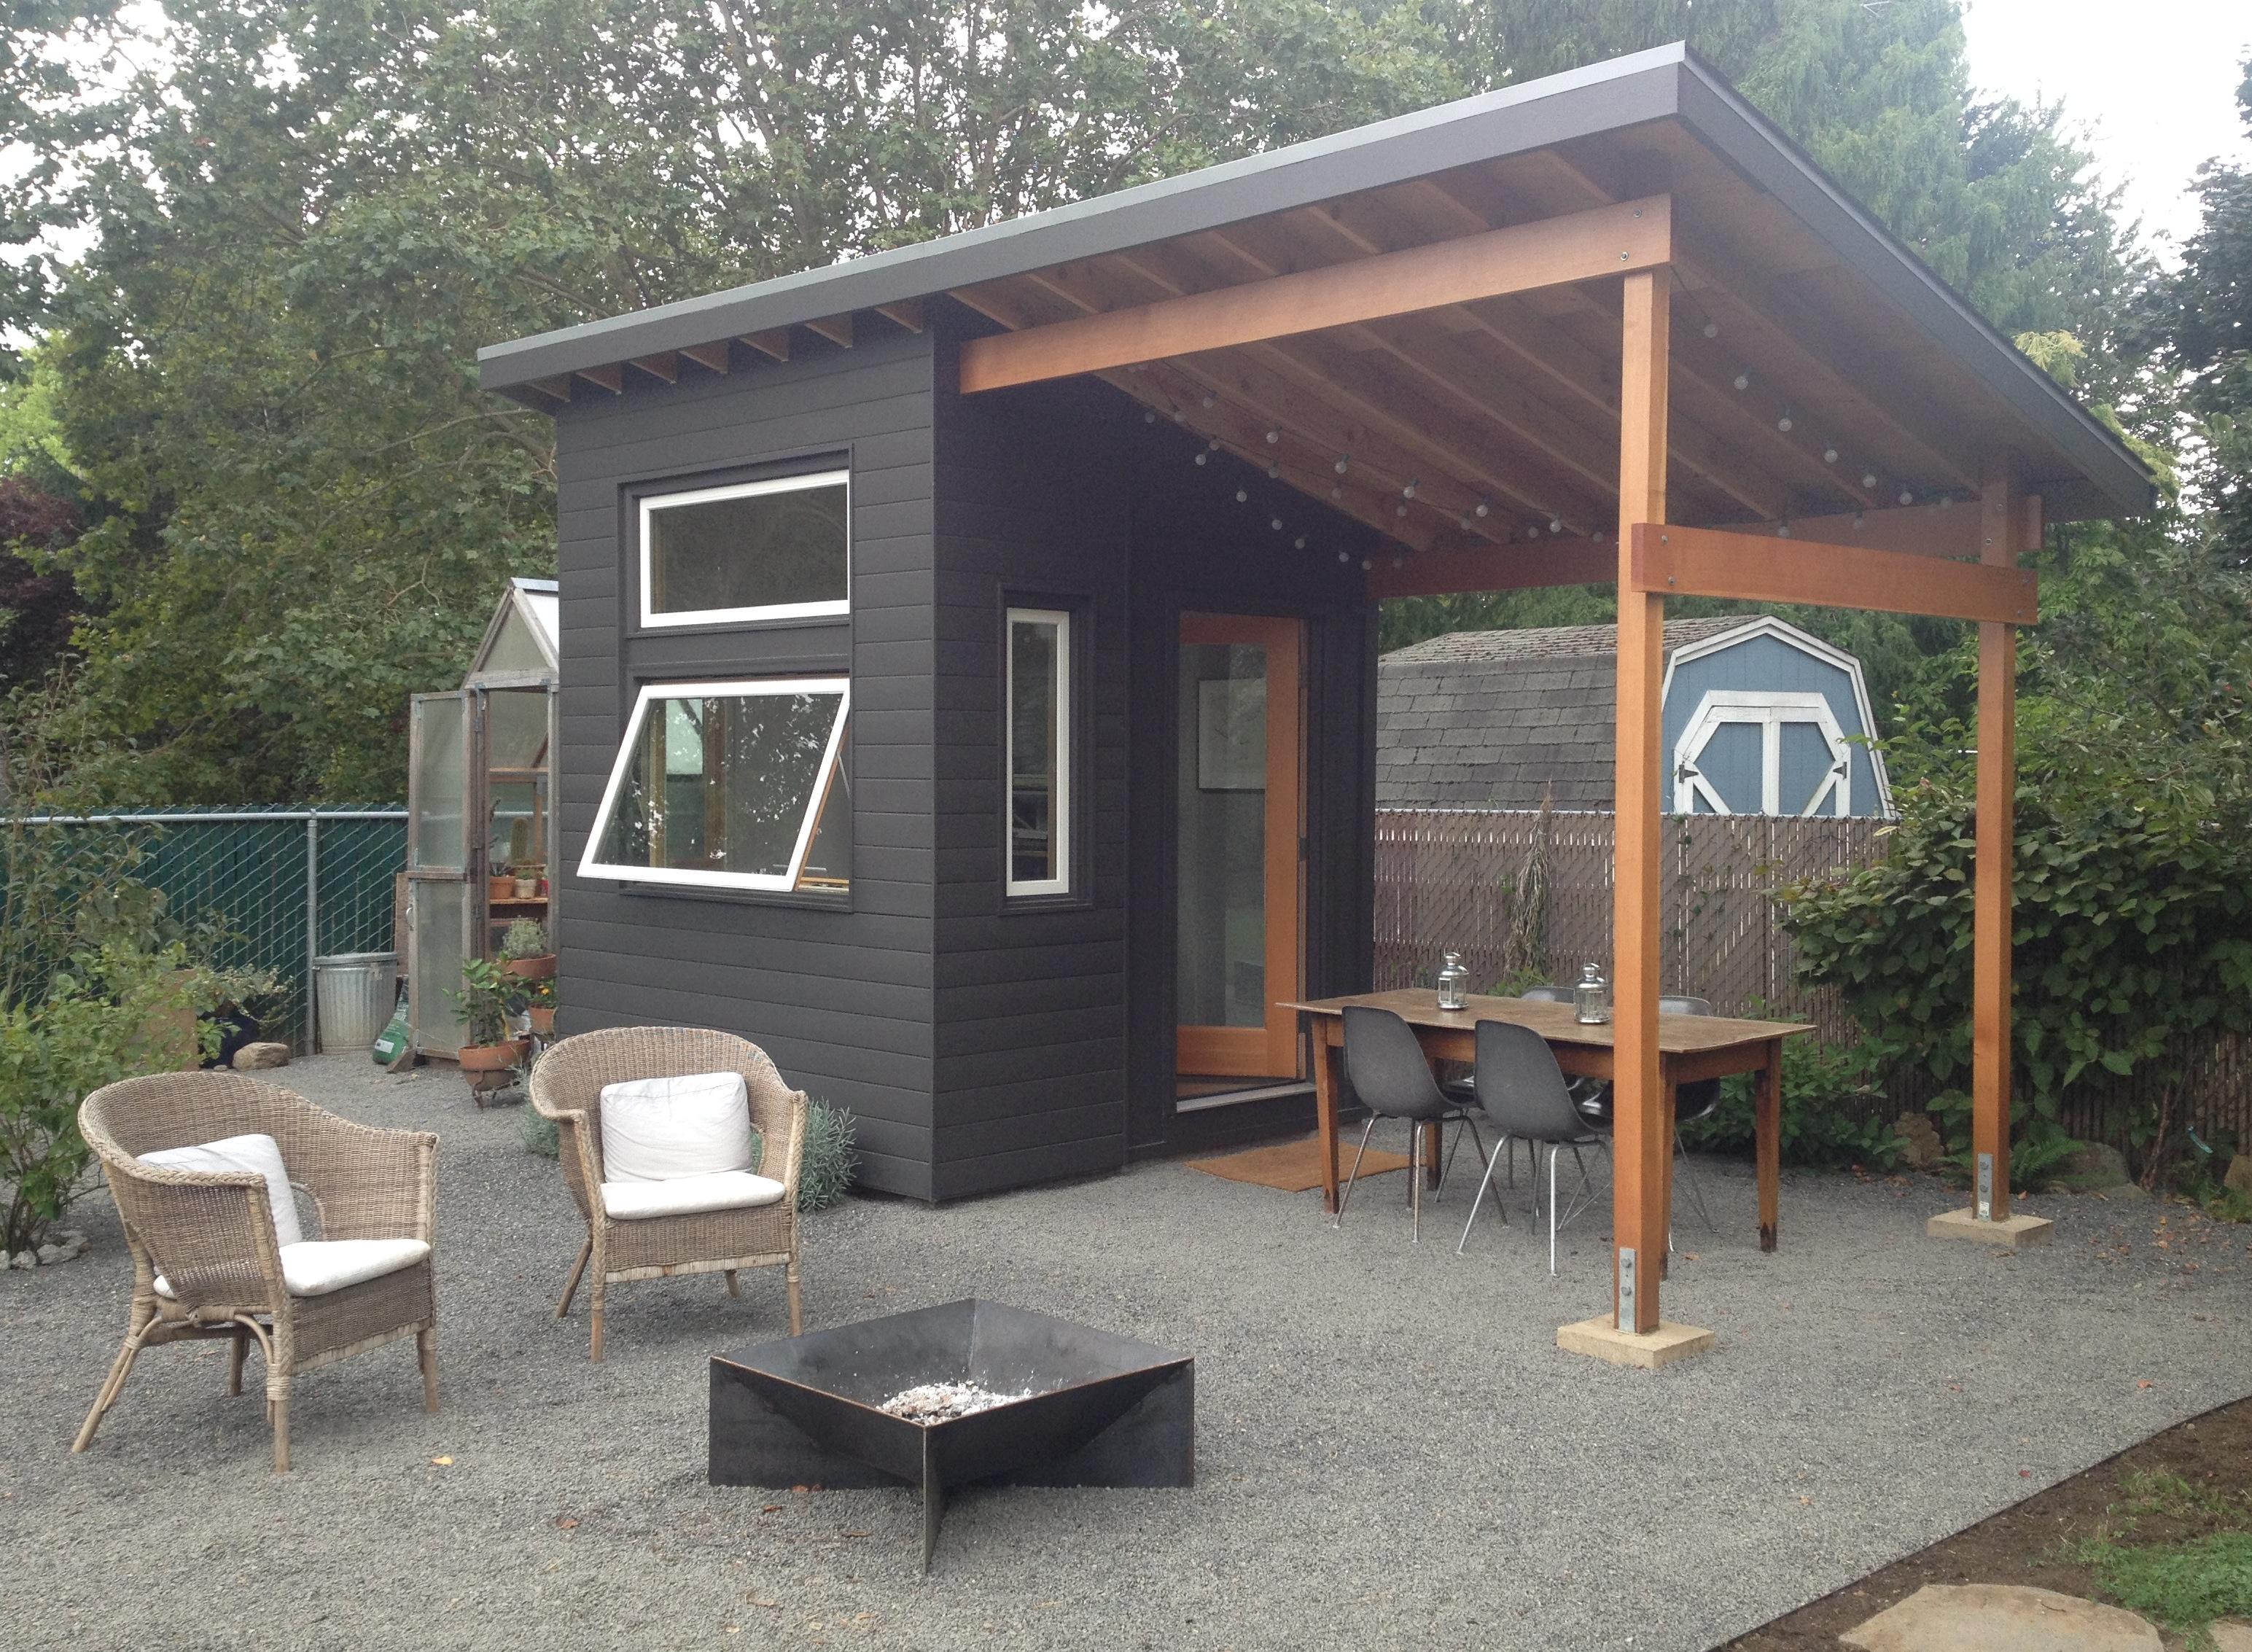 15 Glorious Backyard Studio Ideas You Need To Accompany ... on Backyard House Ideas id=91291